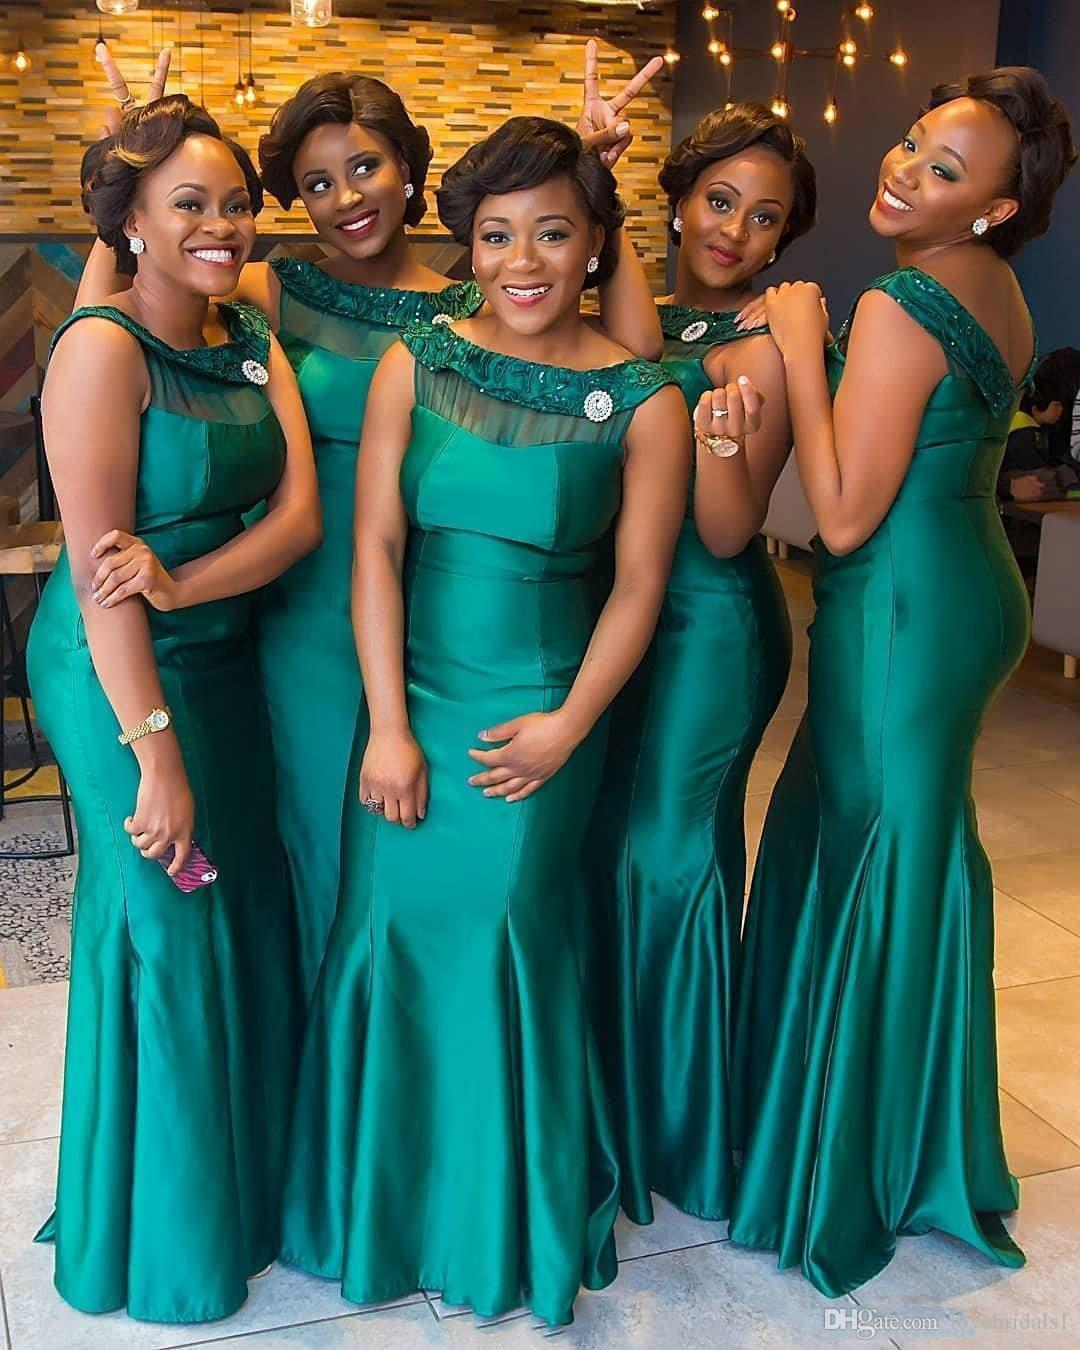 2019 New South African Hunter Green Mermaid Bridesmaid Dresses Arabic Black Girls Mermaid Scoop Neckline Plus Size Maid of Honor Gowns